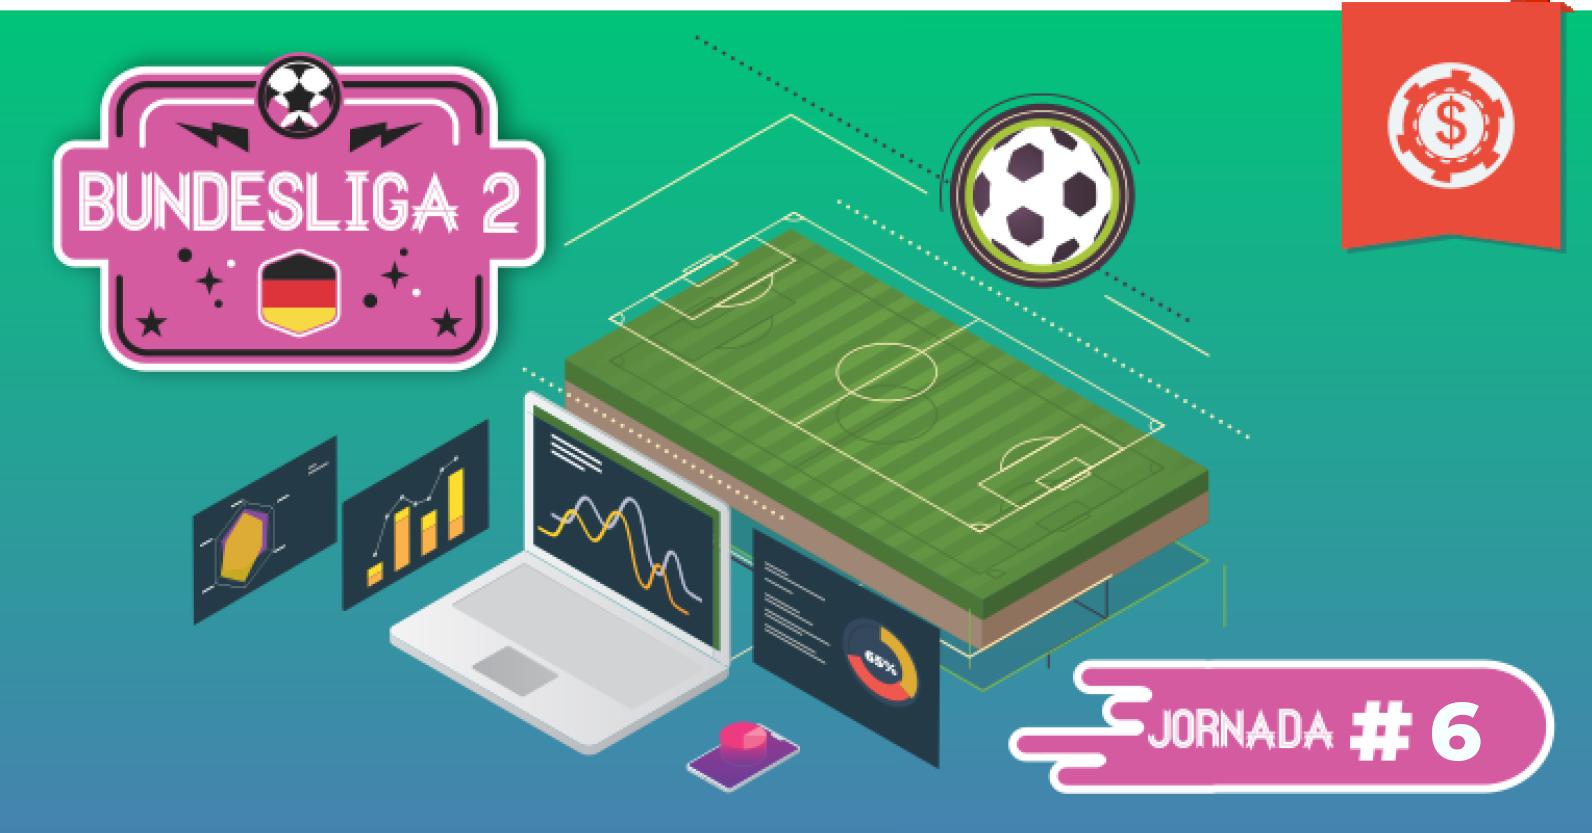 pronosticos-bundesliga-2-segunda-division-liga-alemana-apuestas-jornada-6